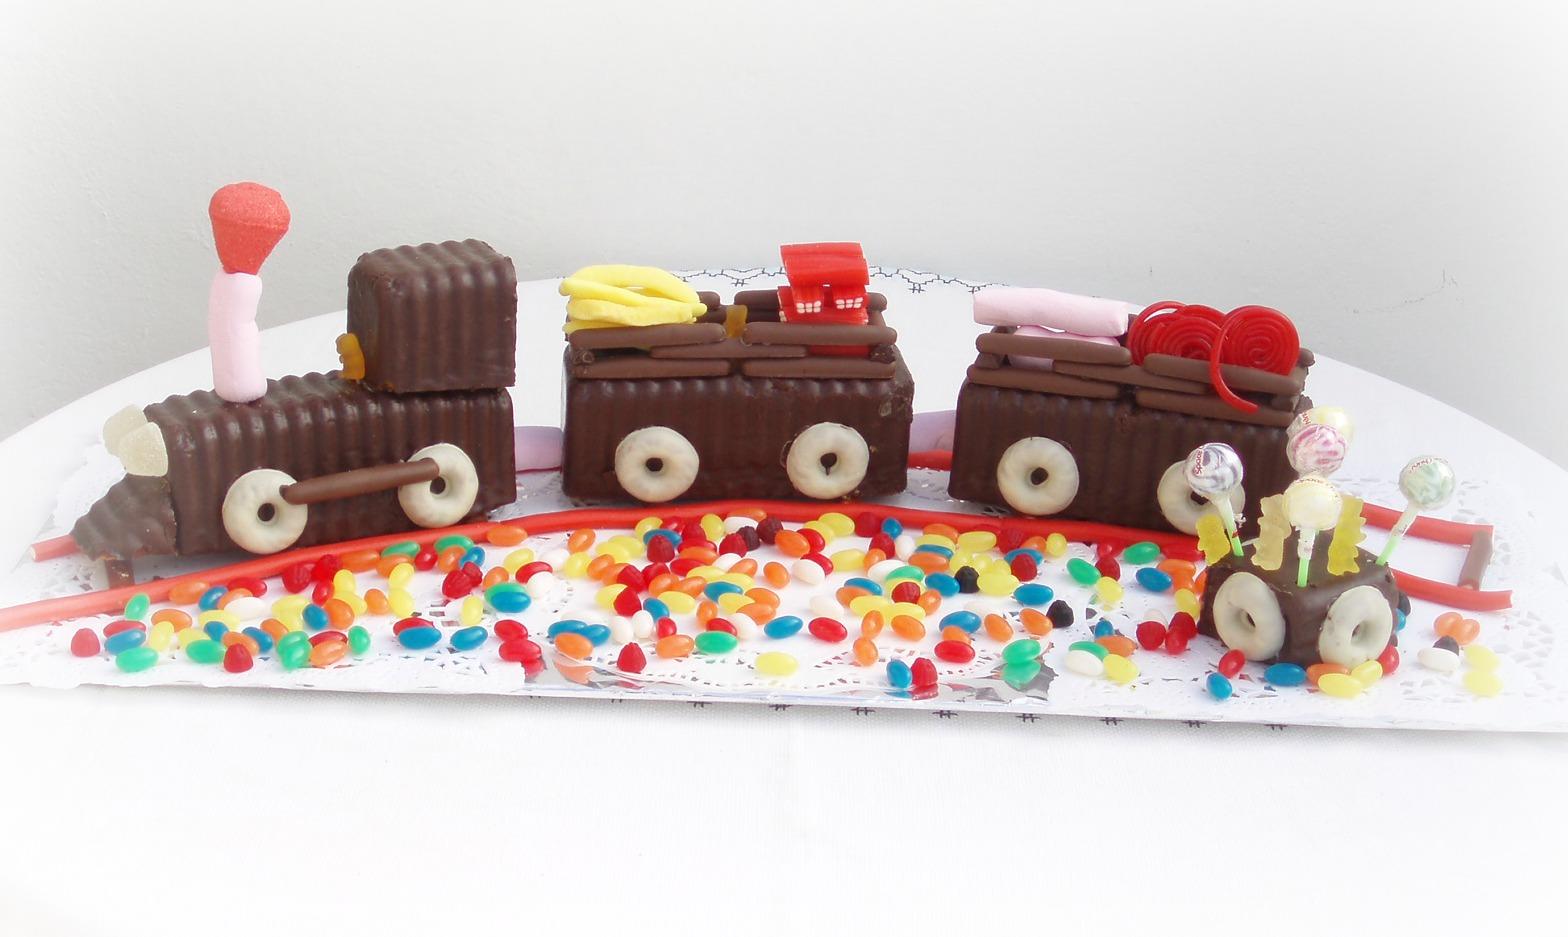 affordable trenecito de chocolate y chuches